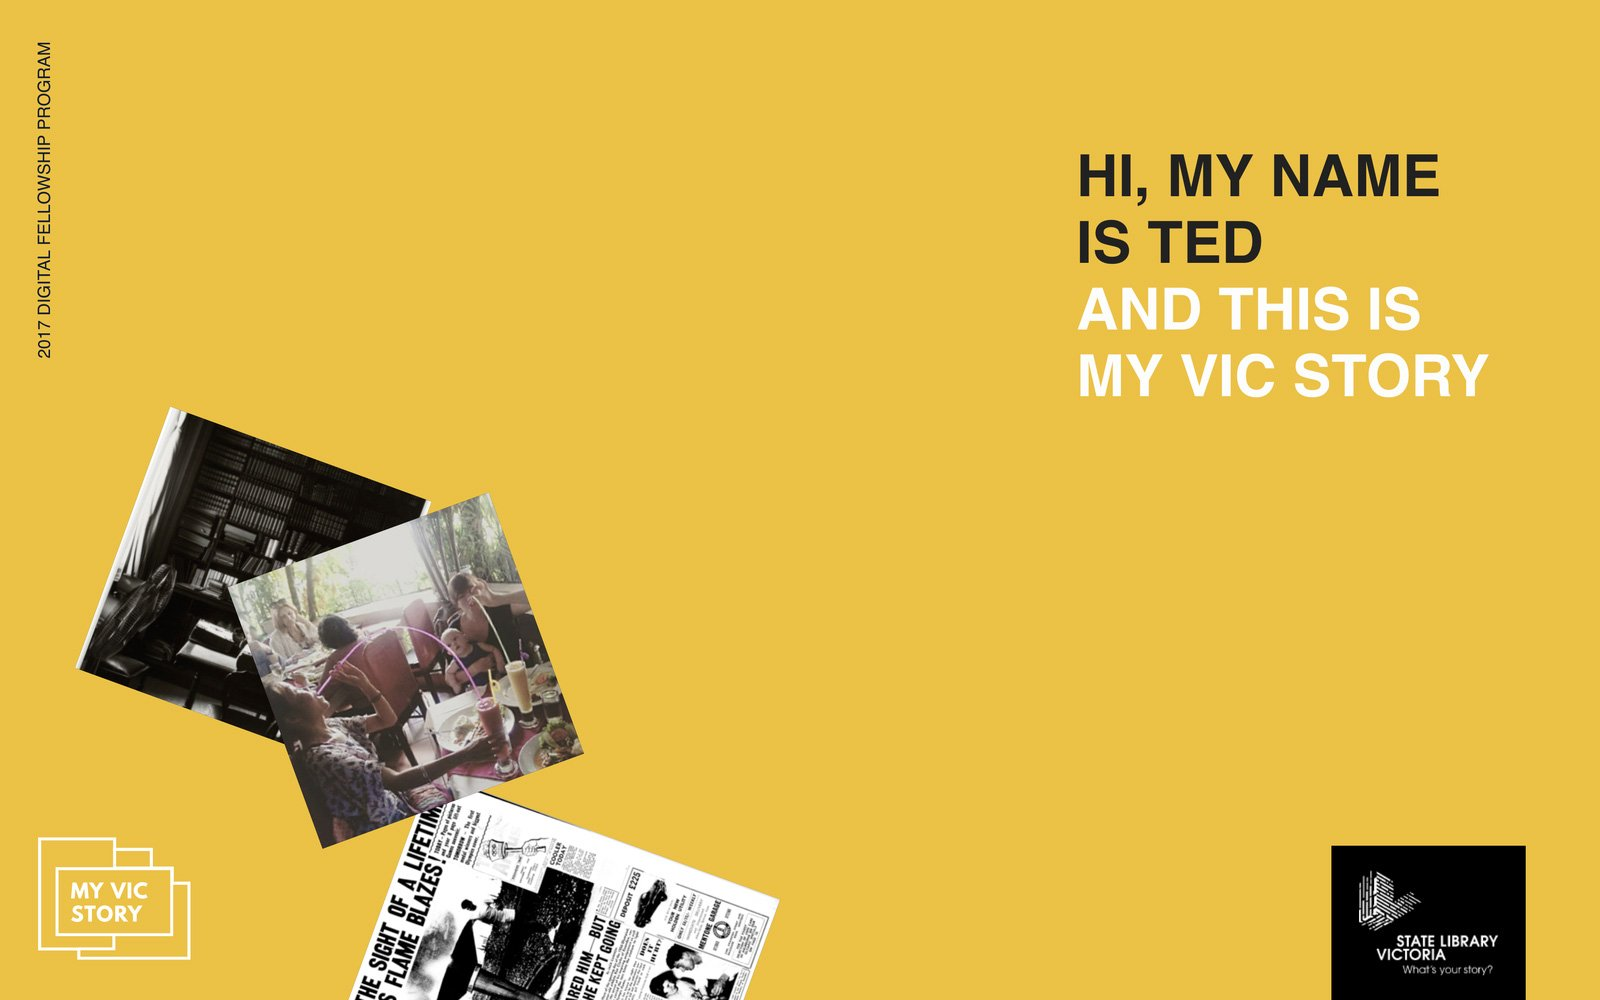 My Vic Story